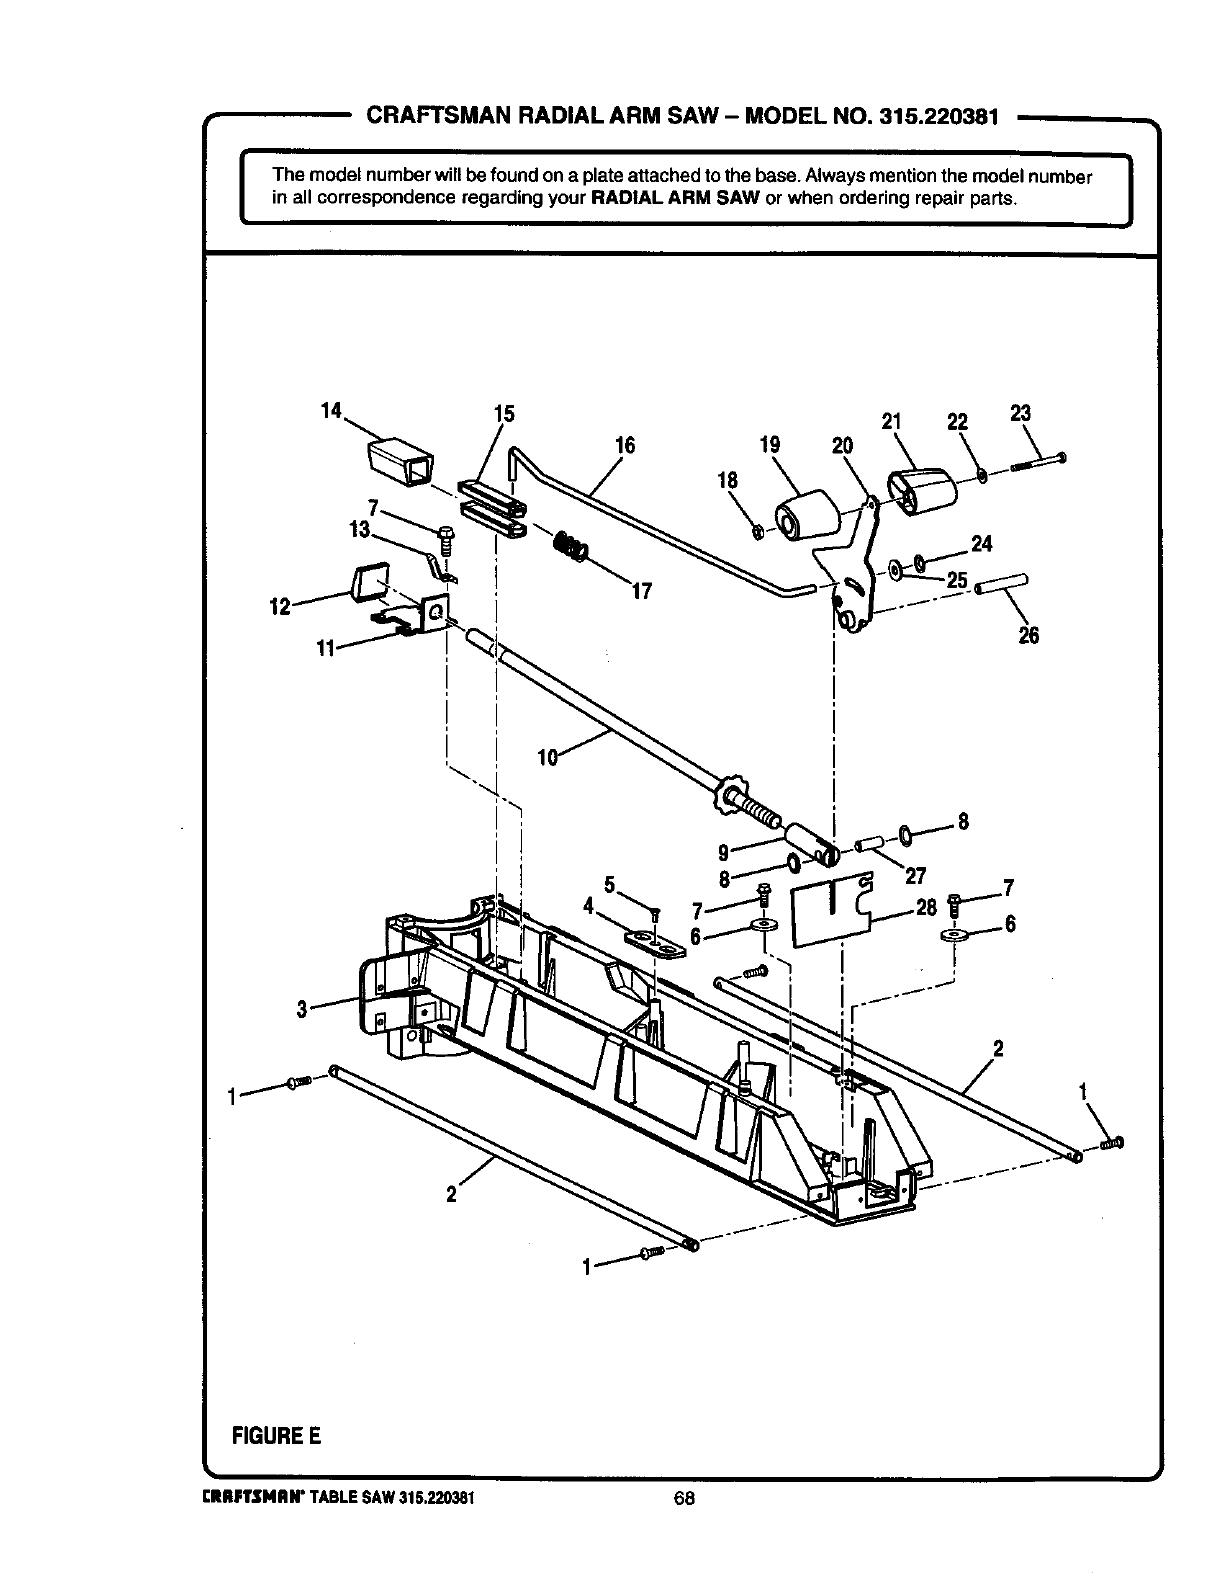 Craftsman 315 220381 Users Manual Radial Arm Saw Wiring Diagram Model No 315220381